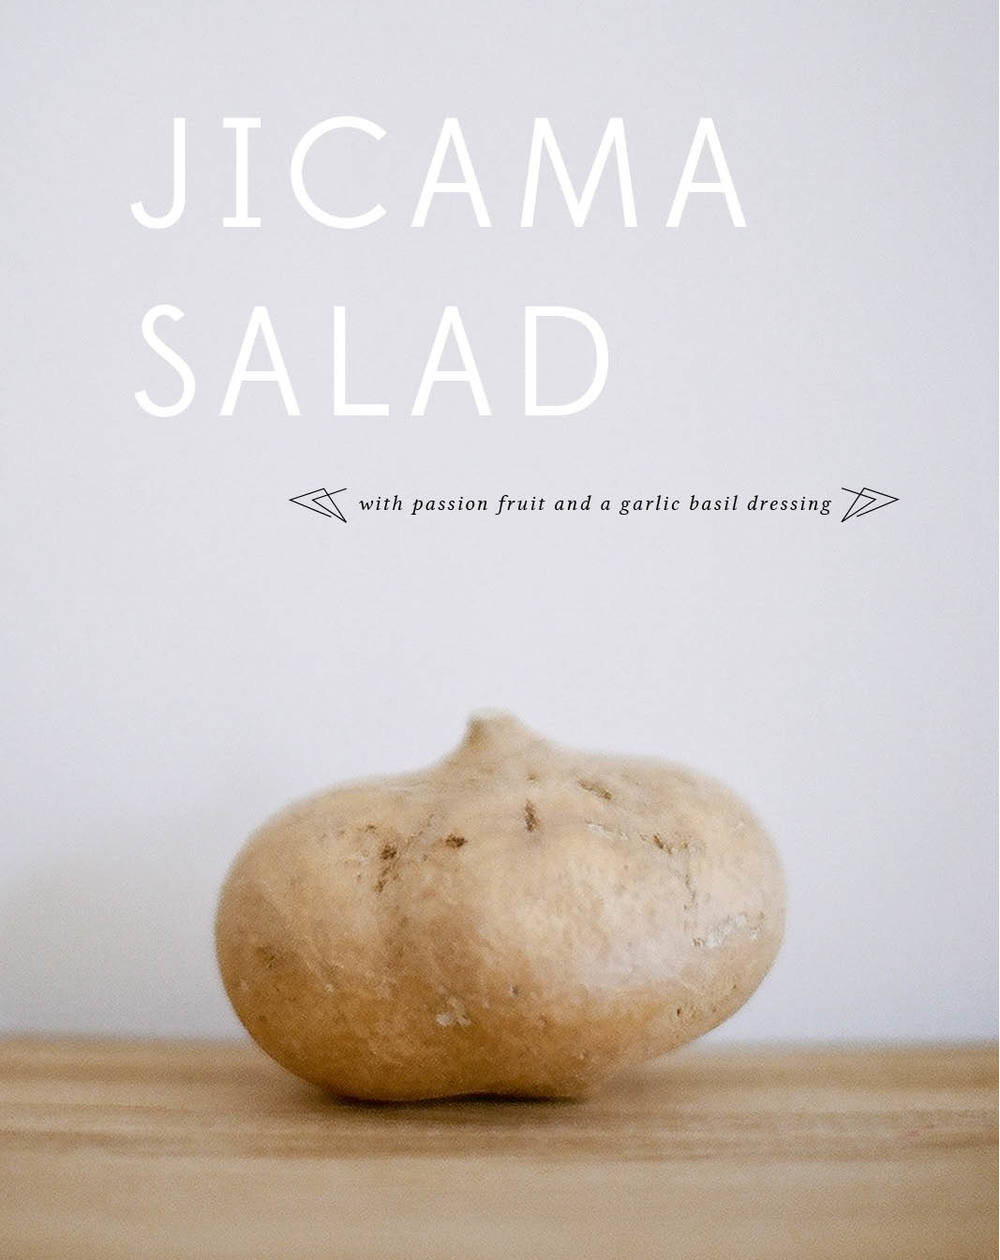 57 Recipe_Jicama Salad with garlic basil passion fruit.jpg